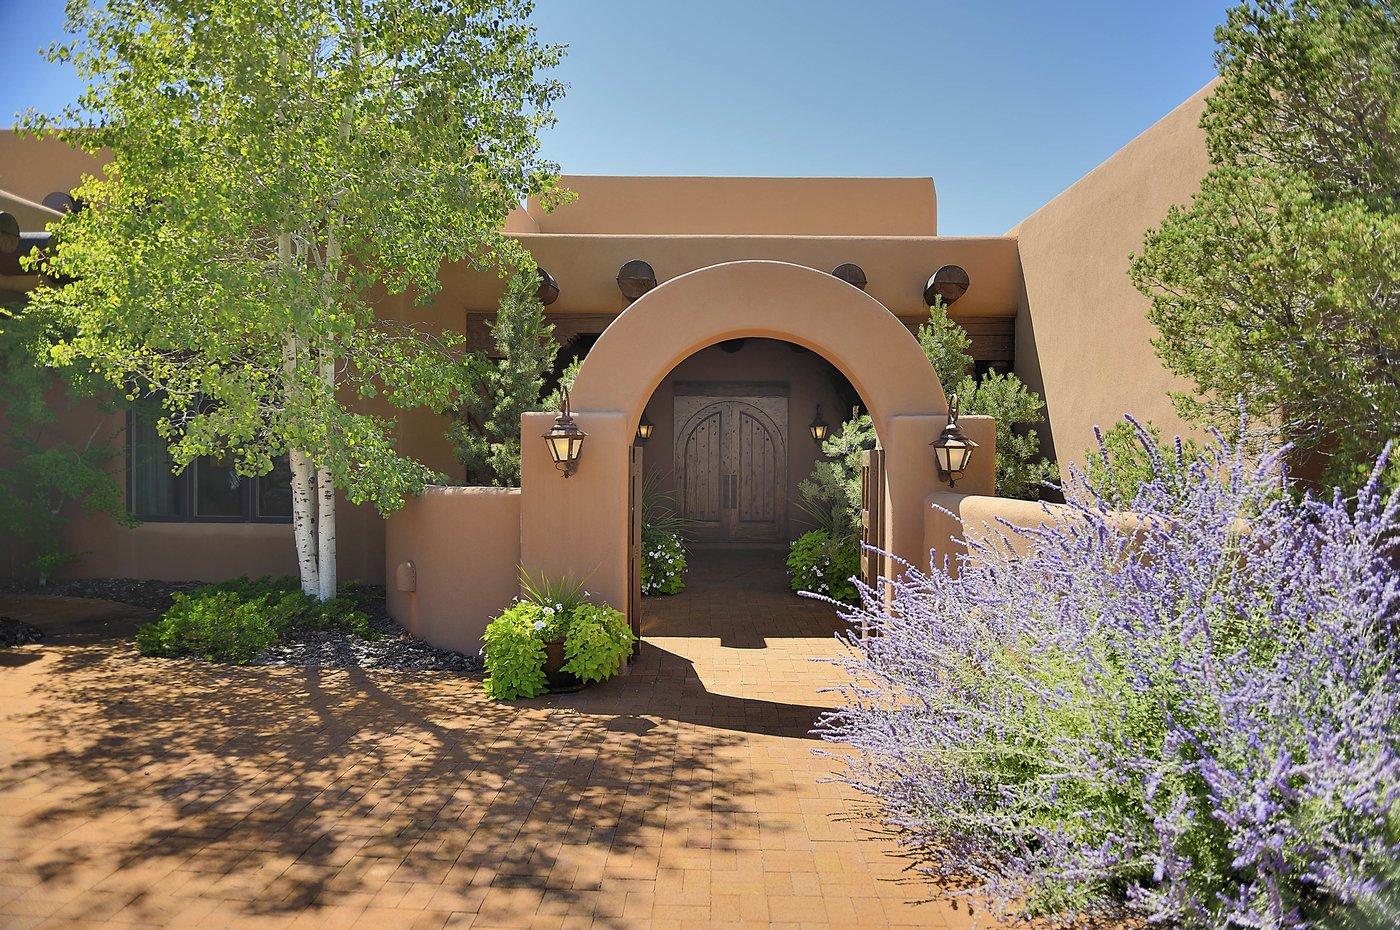 127 Wildhorse Lot 682 Santa Fe NM 87506 MLS 201805007